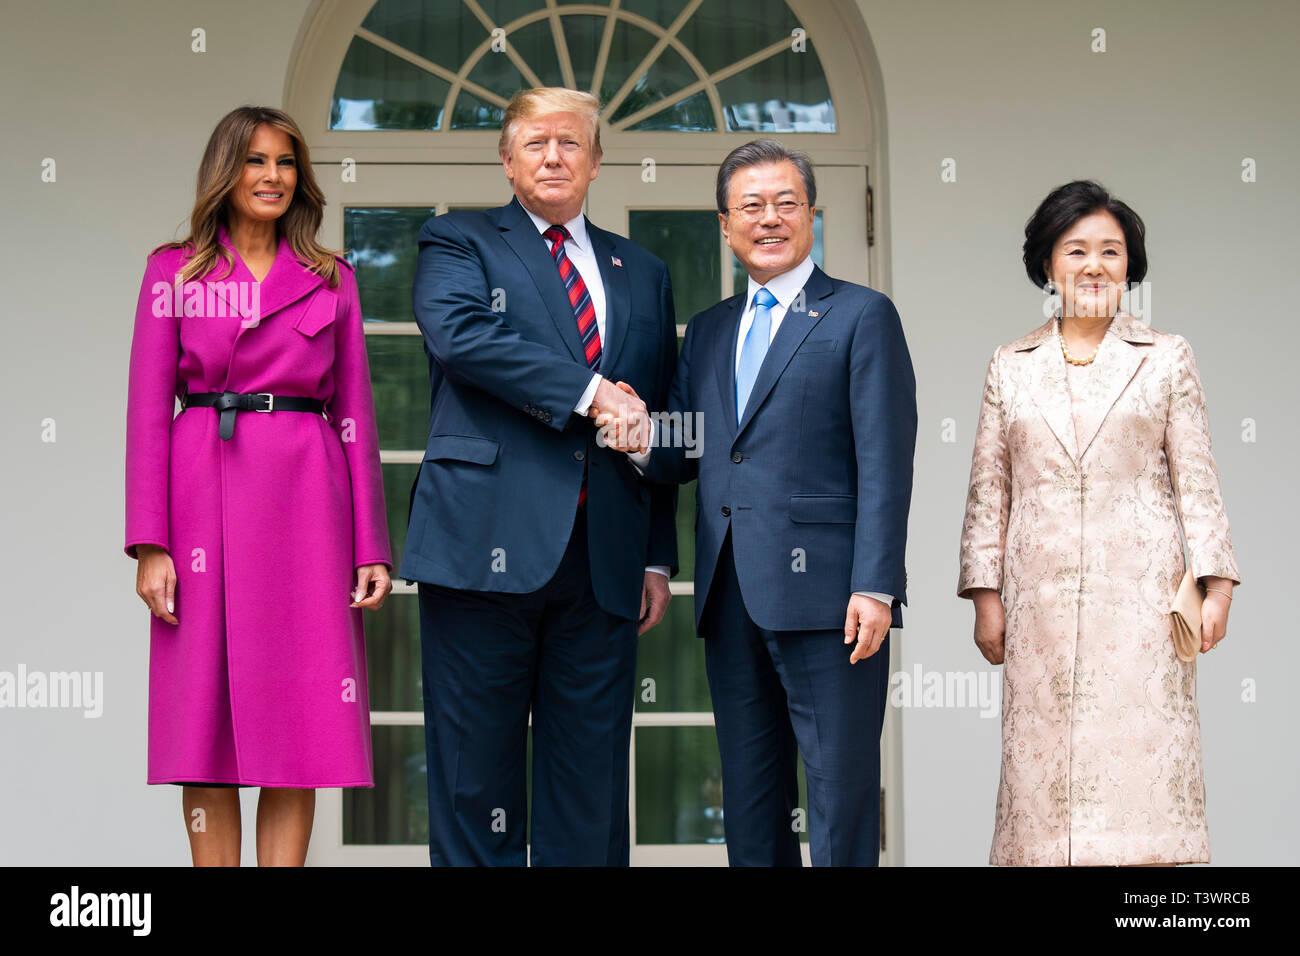 Washington, DC, USA  11th Apr, 2019  US President Donald J